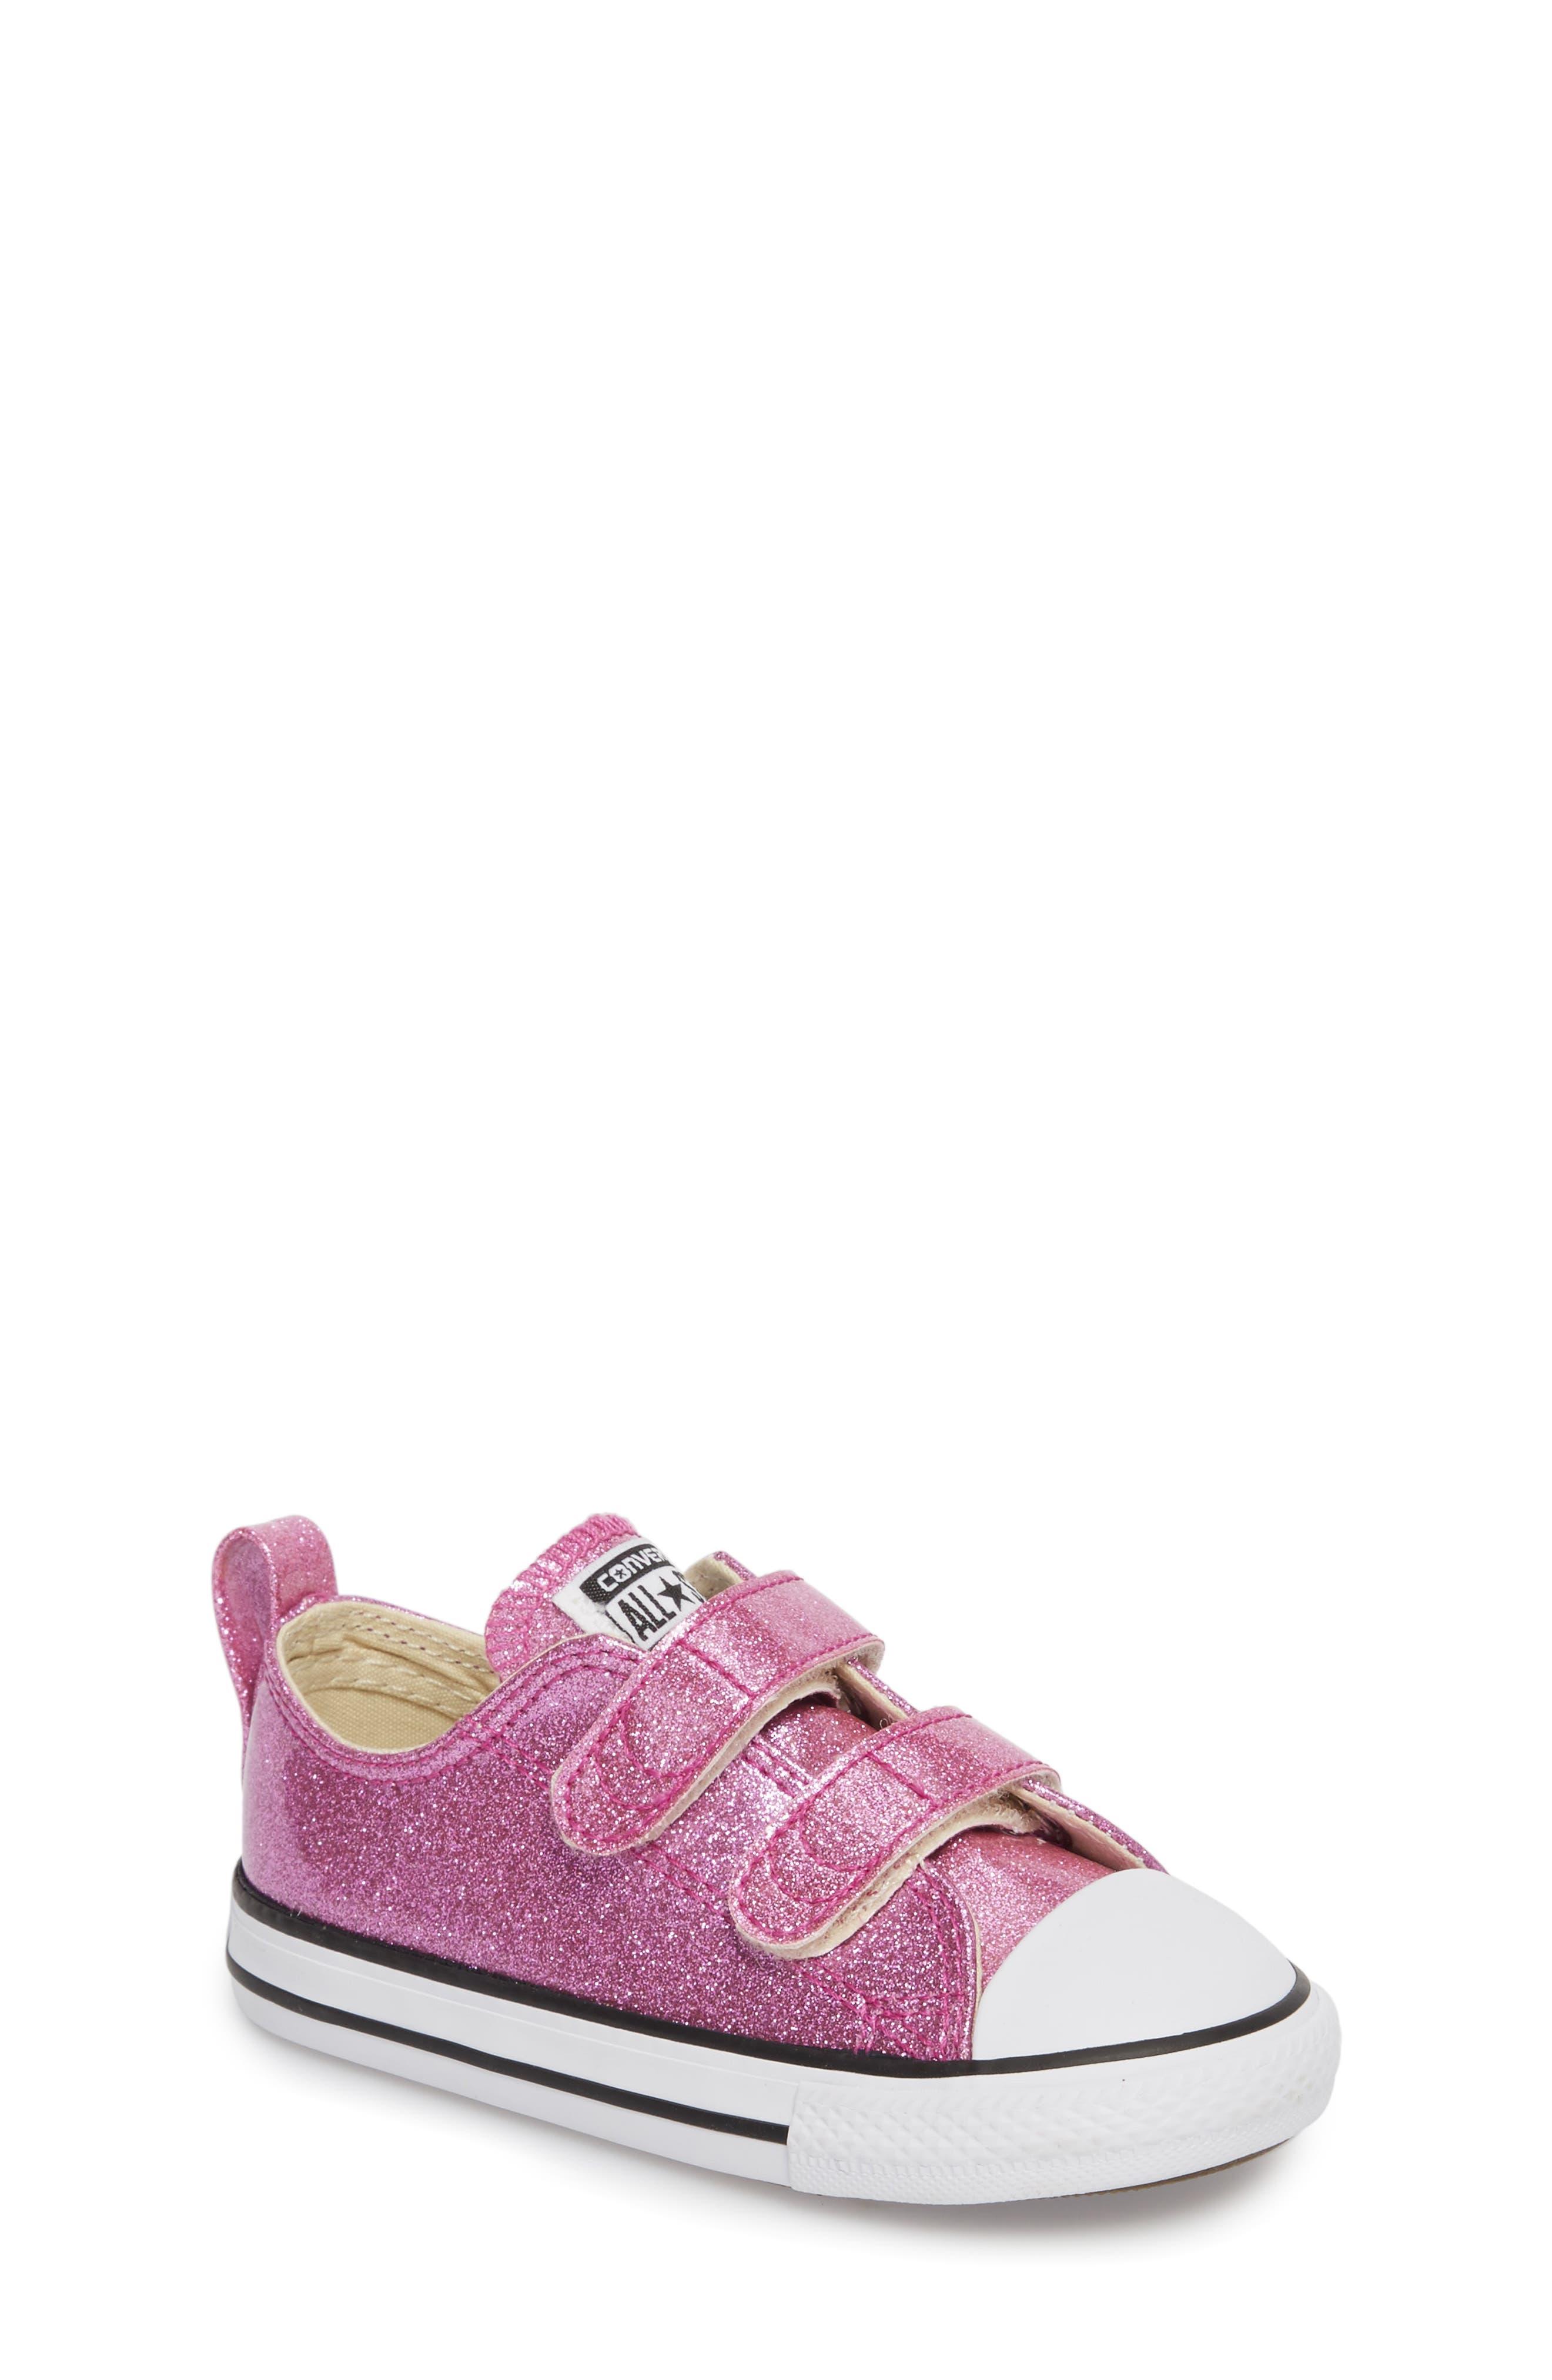 All Star<sup>®</sup> Seasonal Glitter Sneaker,                         Main,                         color, 500